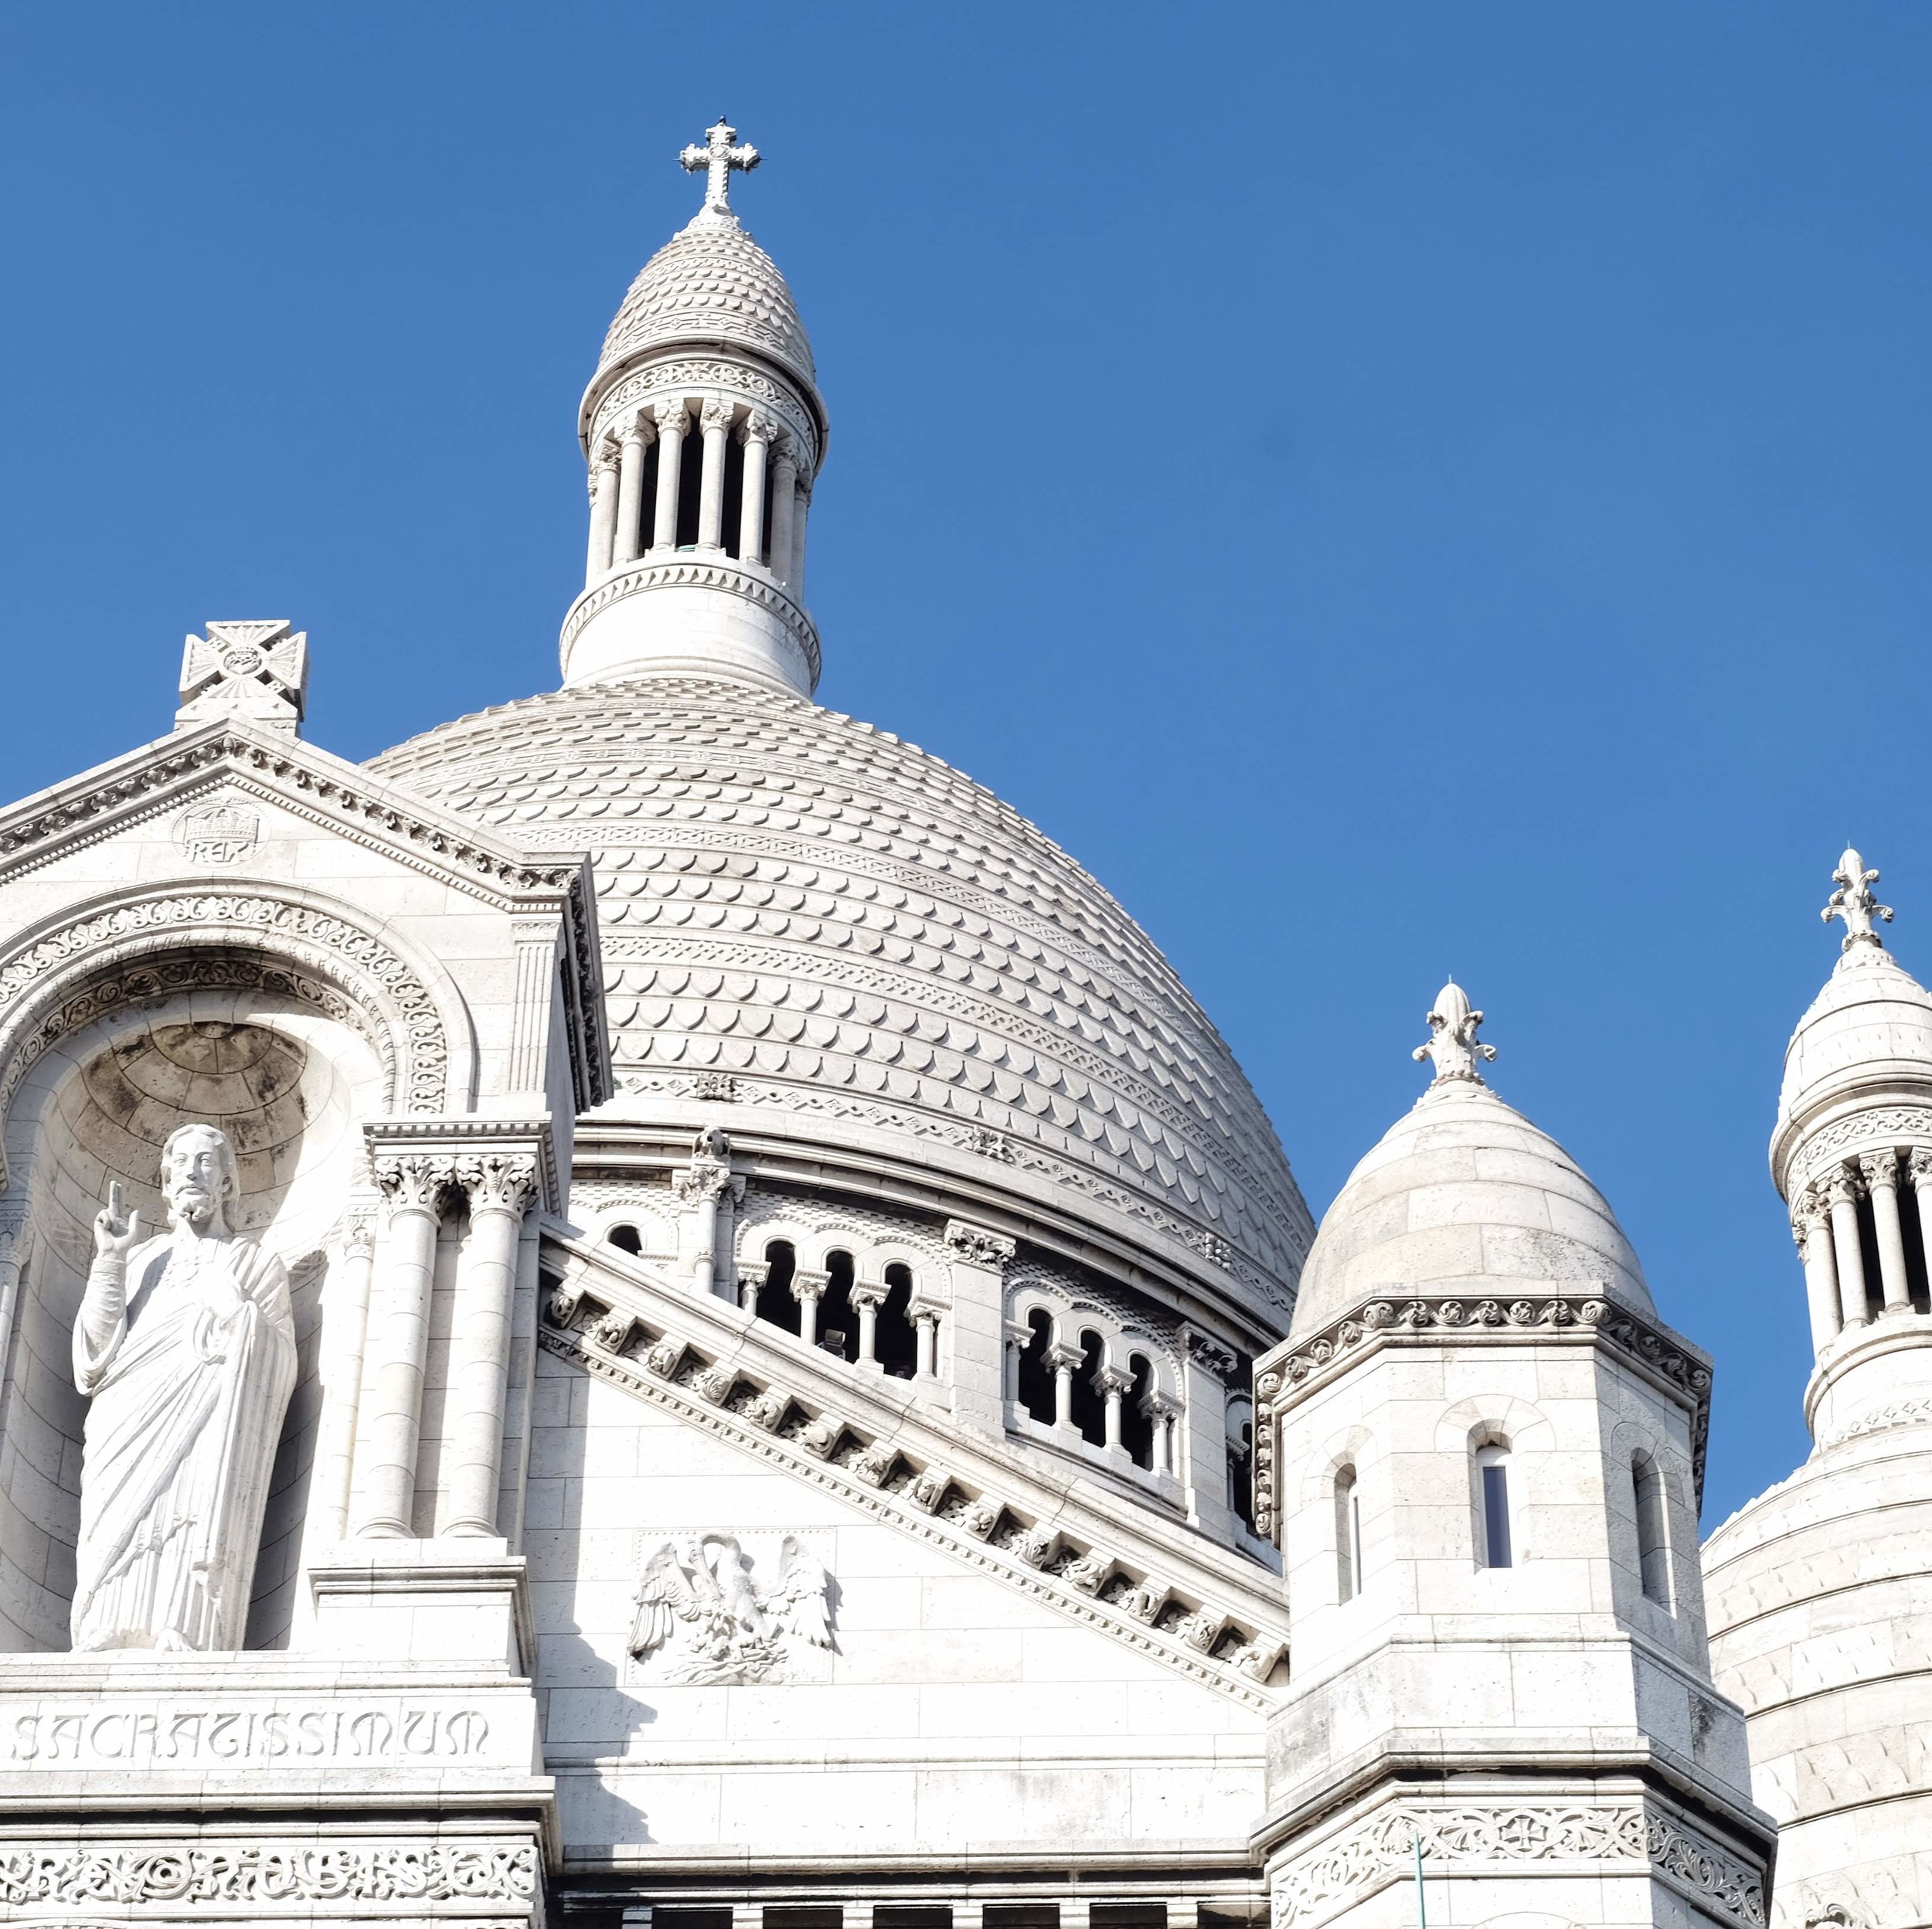 The stunning Sacré Coeur Basilica